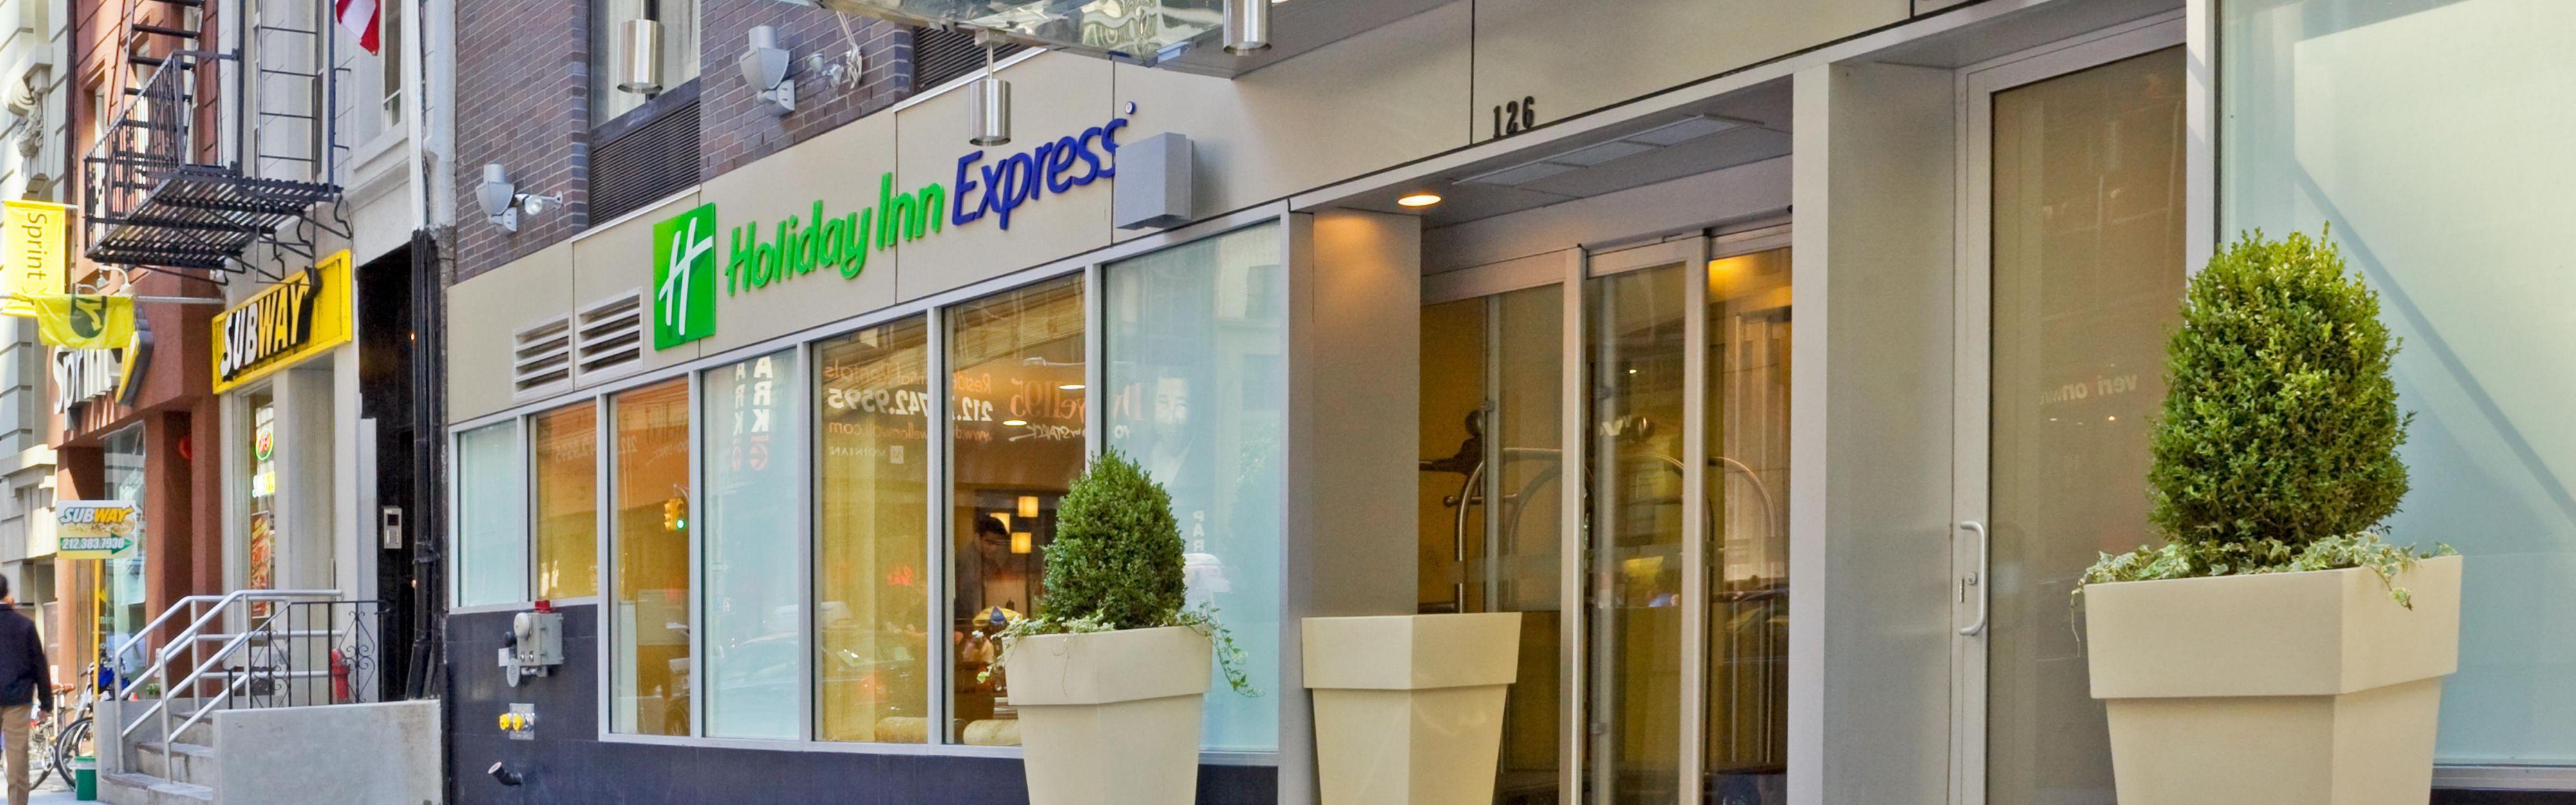 Holiday Inn Express New York City-Wall Street image 0